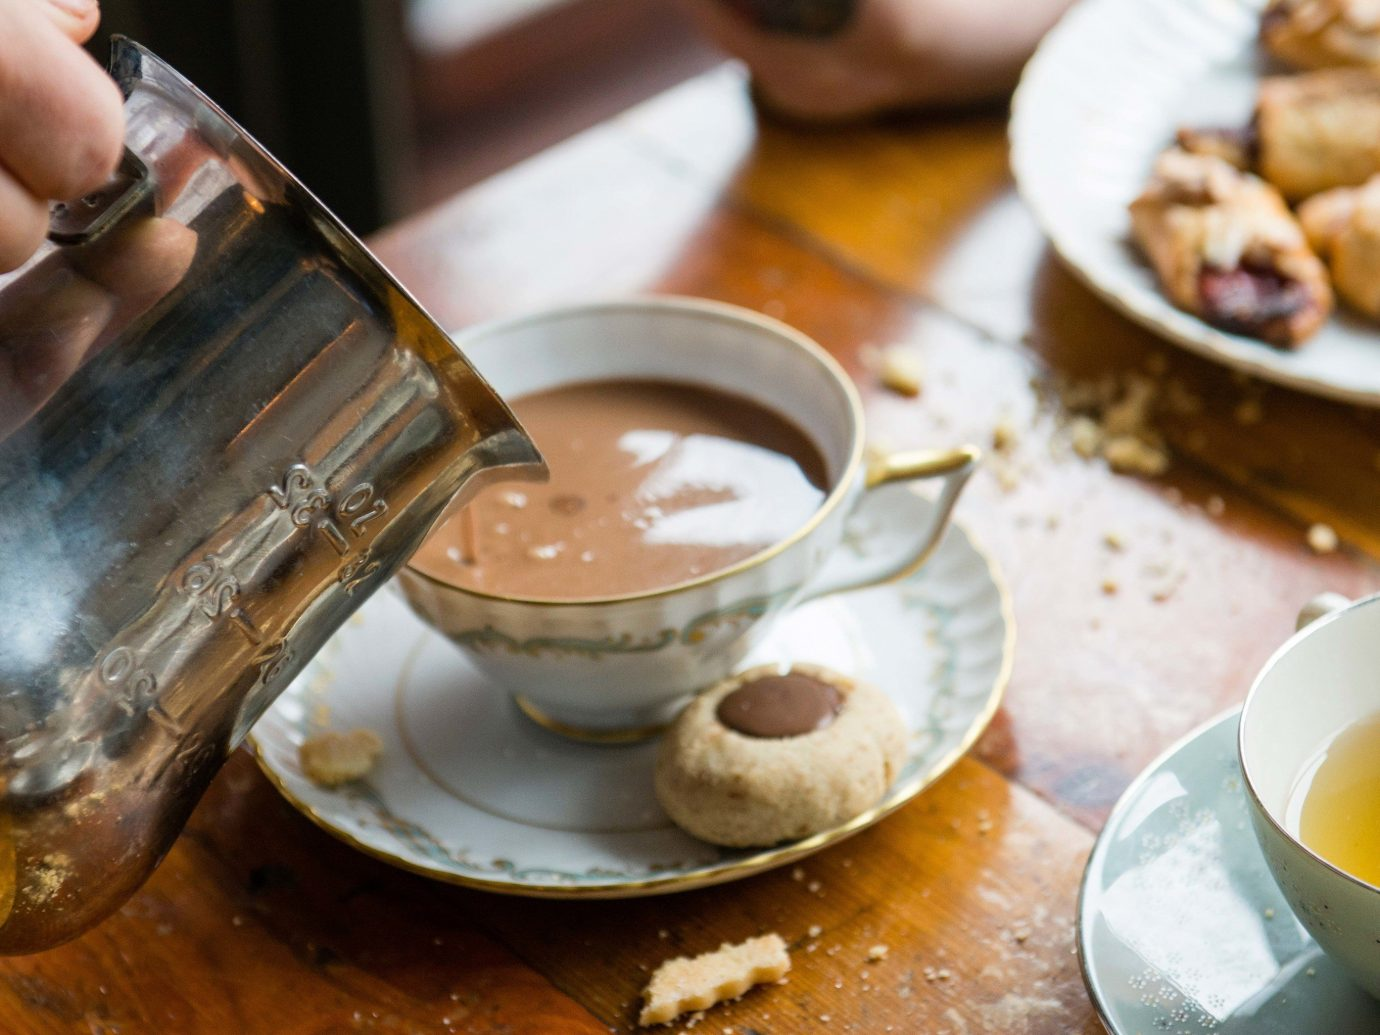 Arts + Culture Food + Drink Hotels Weekend Getaways food plate dish cuisine breakfast tea flavor finger food meal brunch beverage